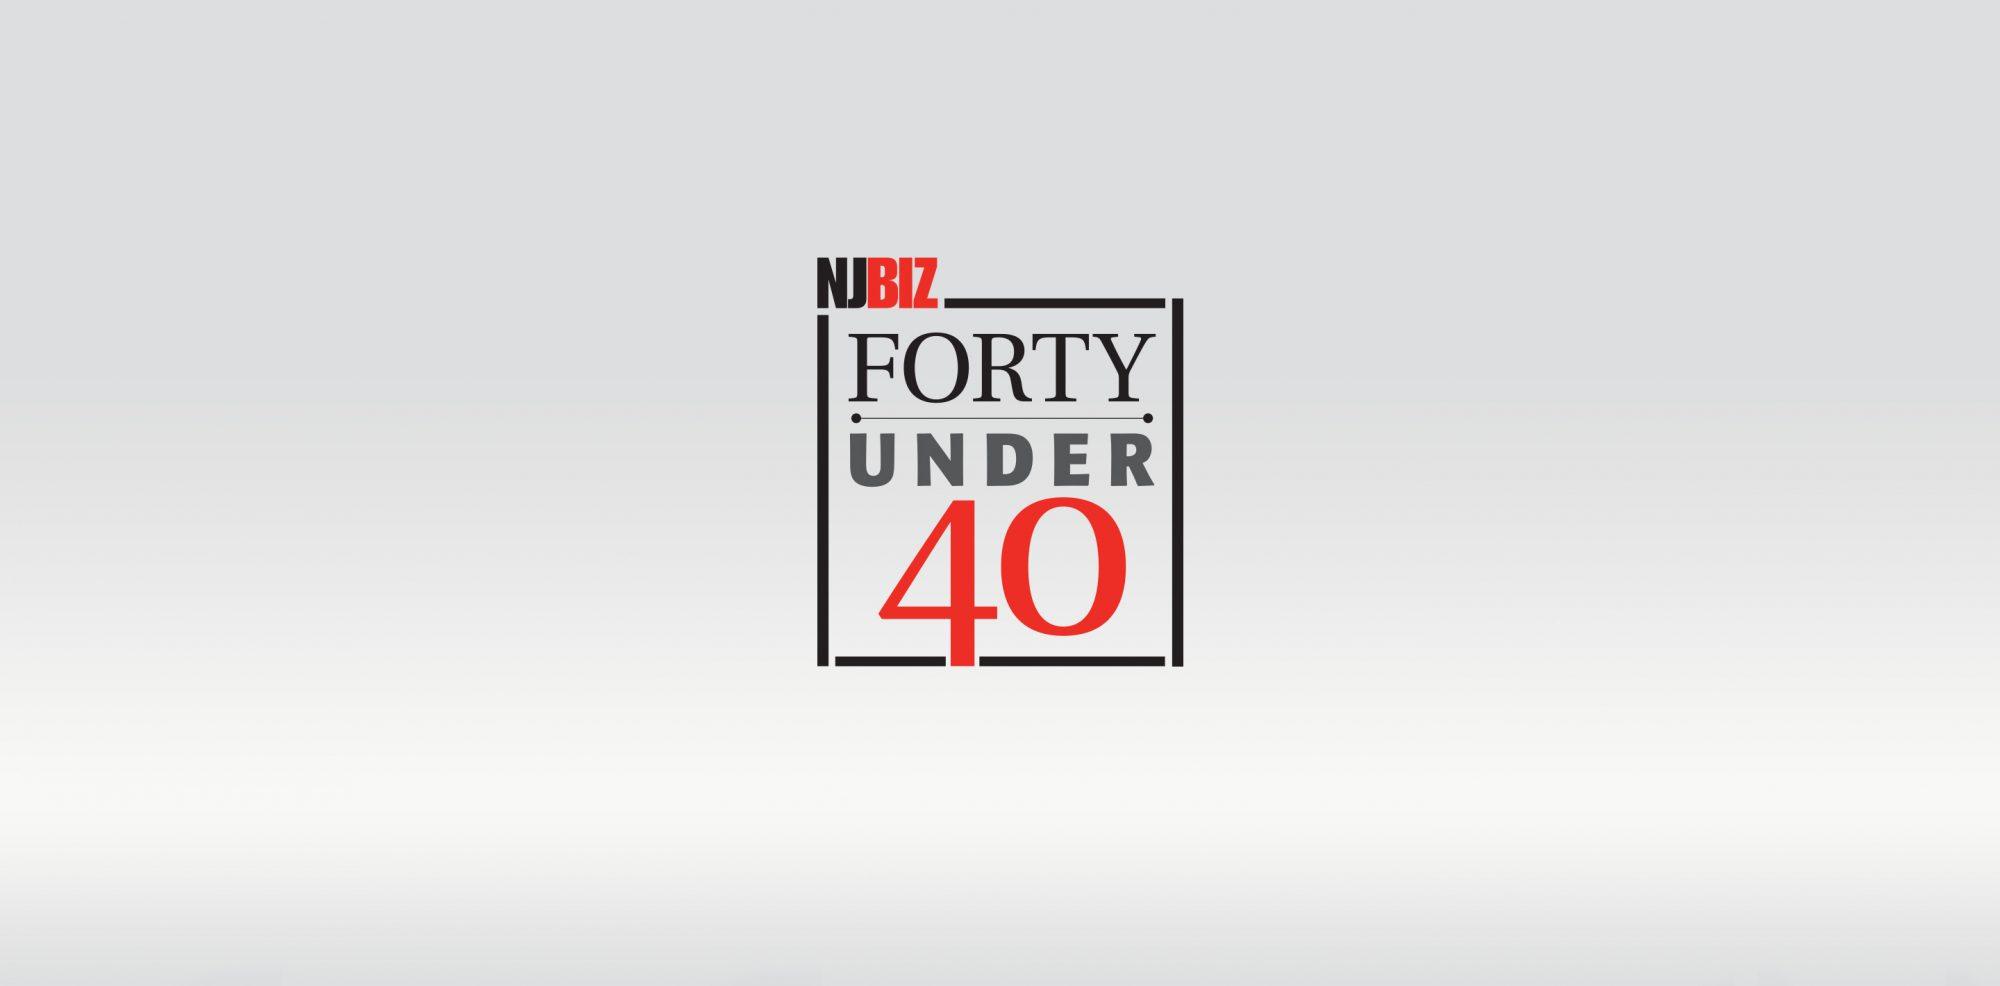 NJBIZ 40 Under 40